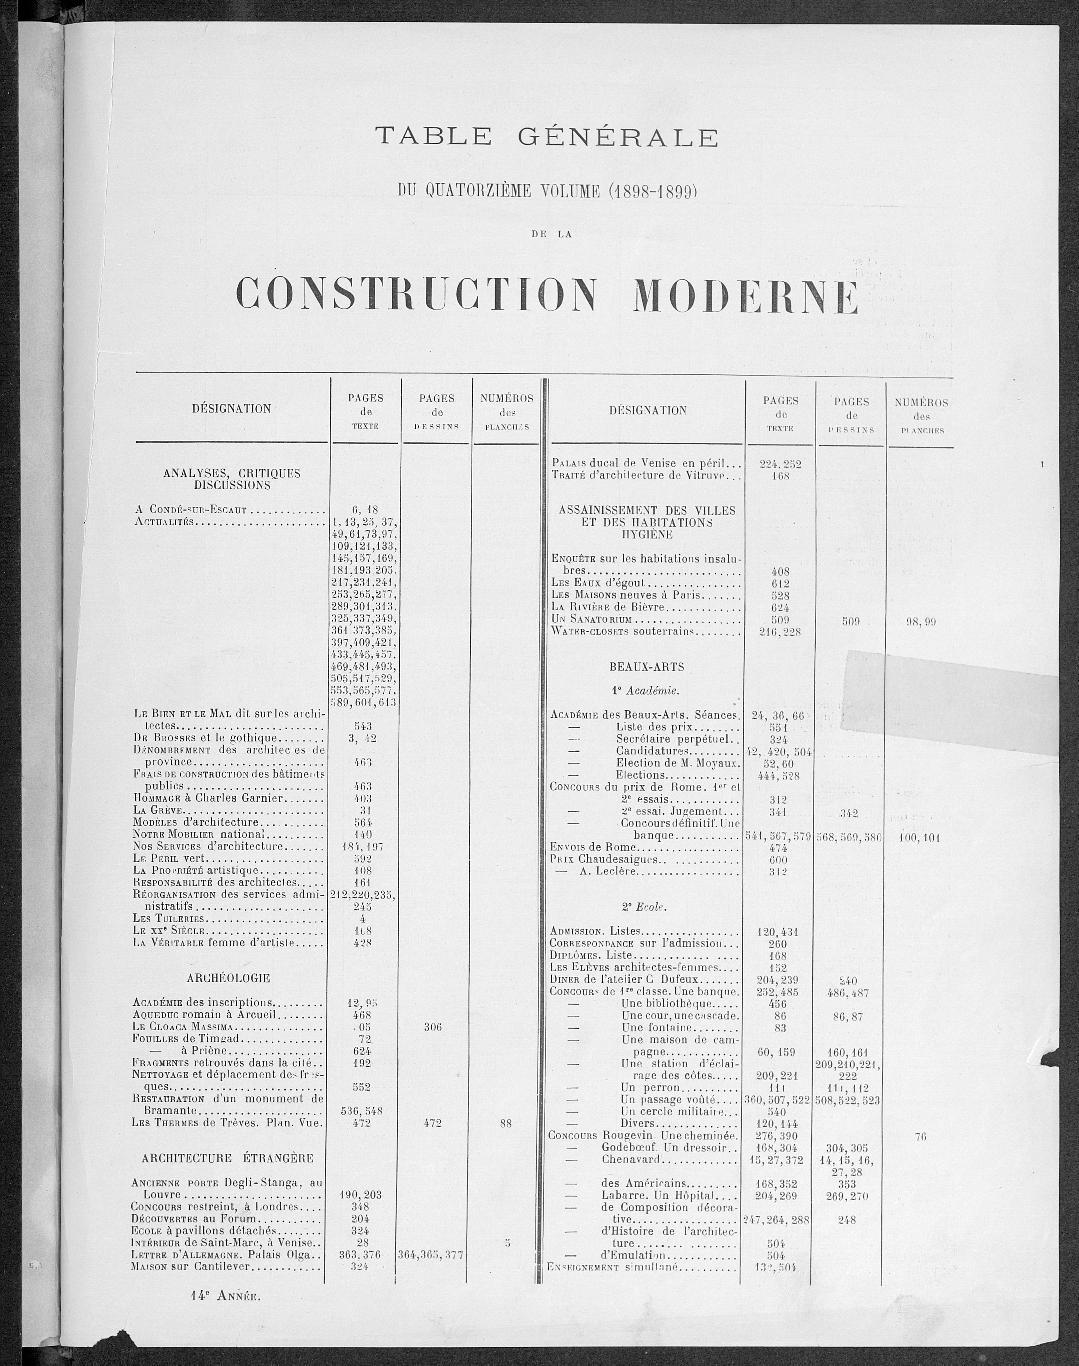 La Construction moderne, Index |